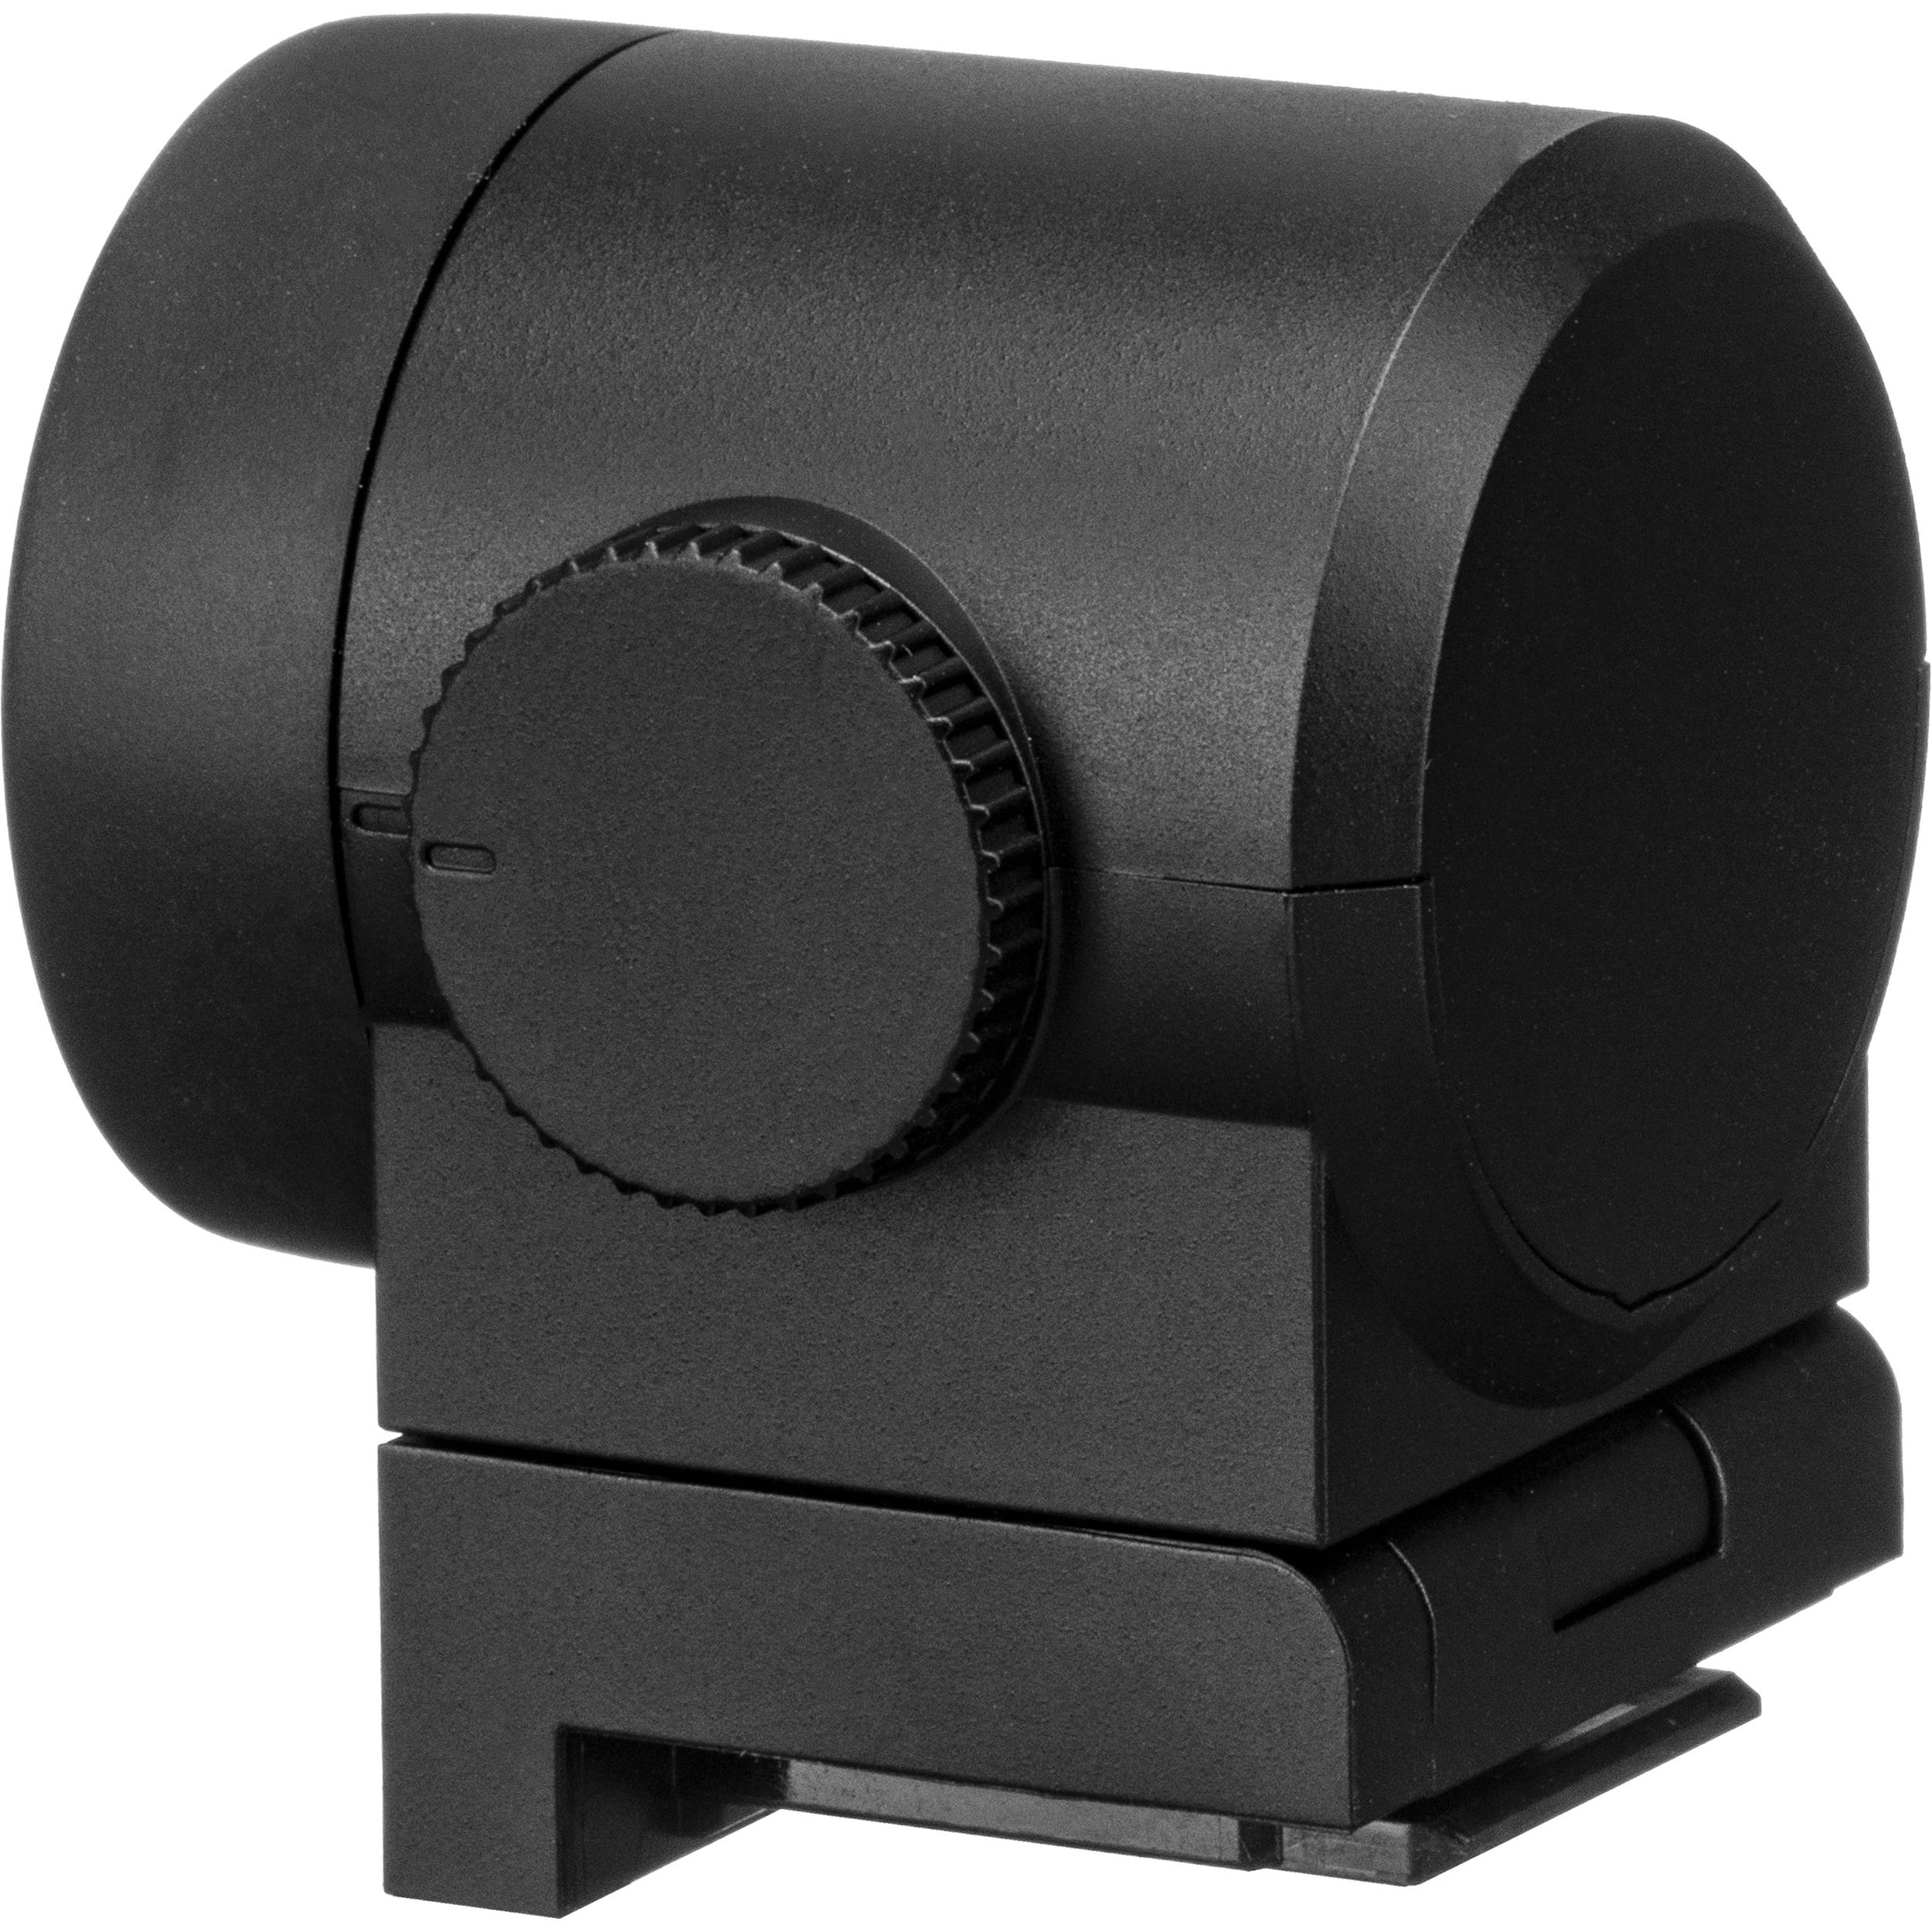 Leica Visoflex (Typ 020) Electronic Viewfinder